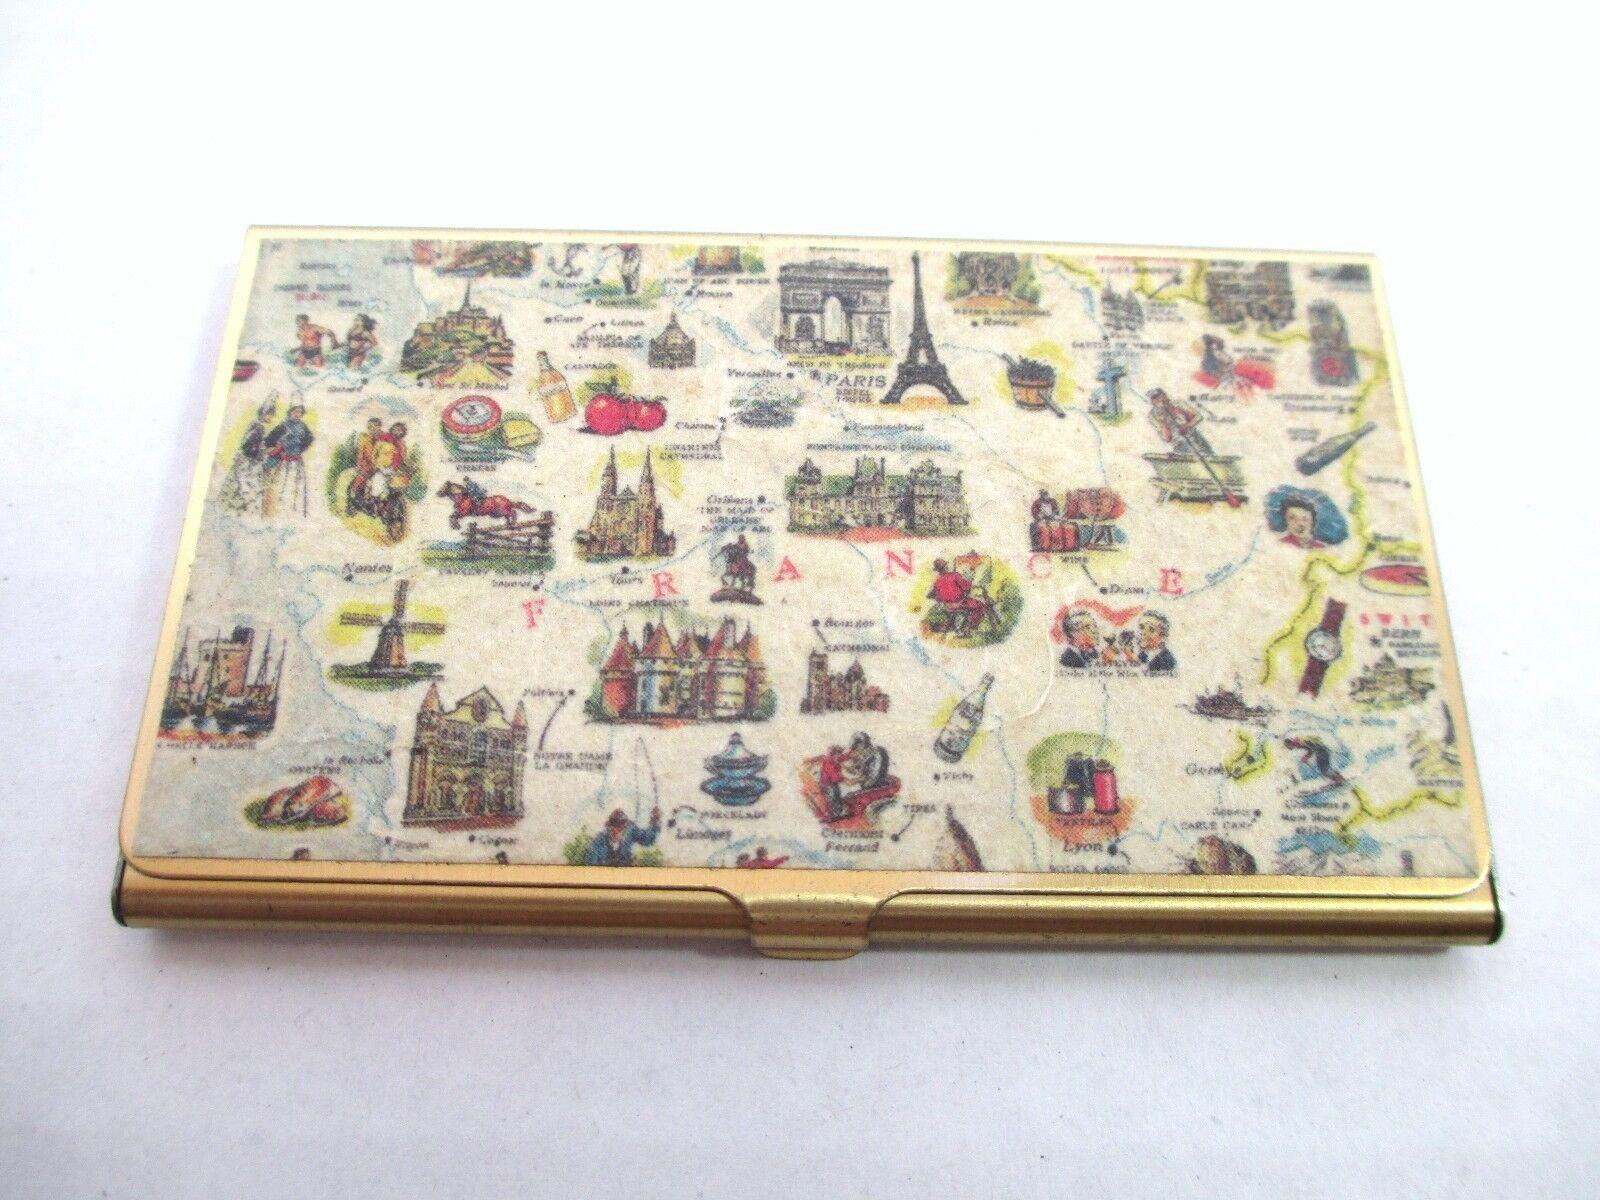 Unusual Vintage French France Business Card or Credit Card Holder